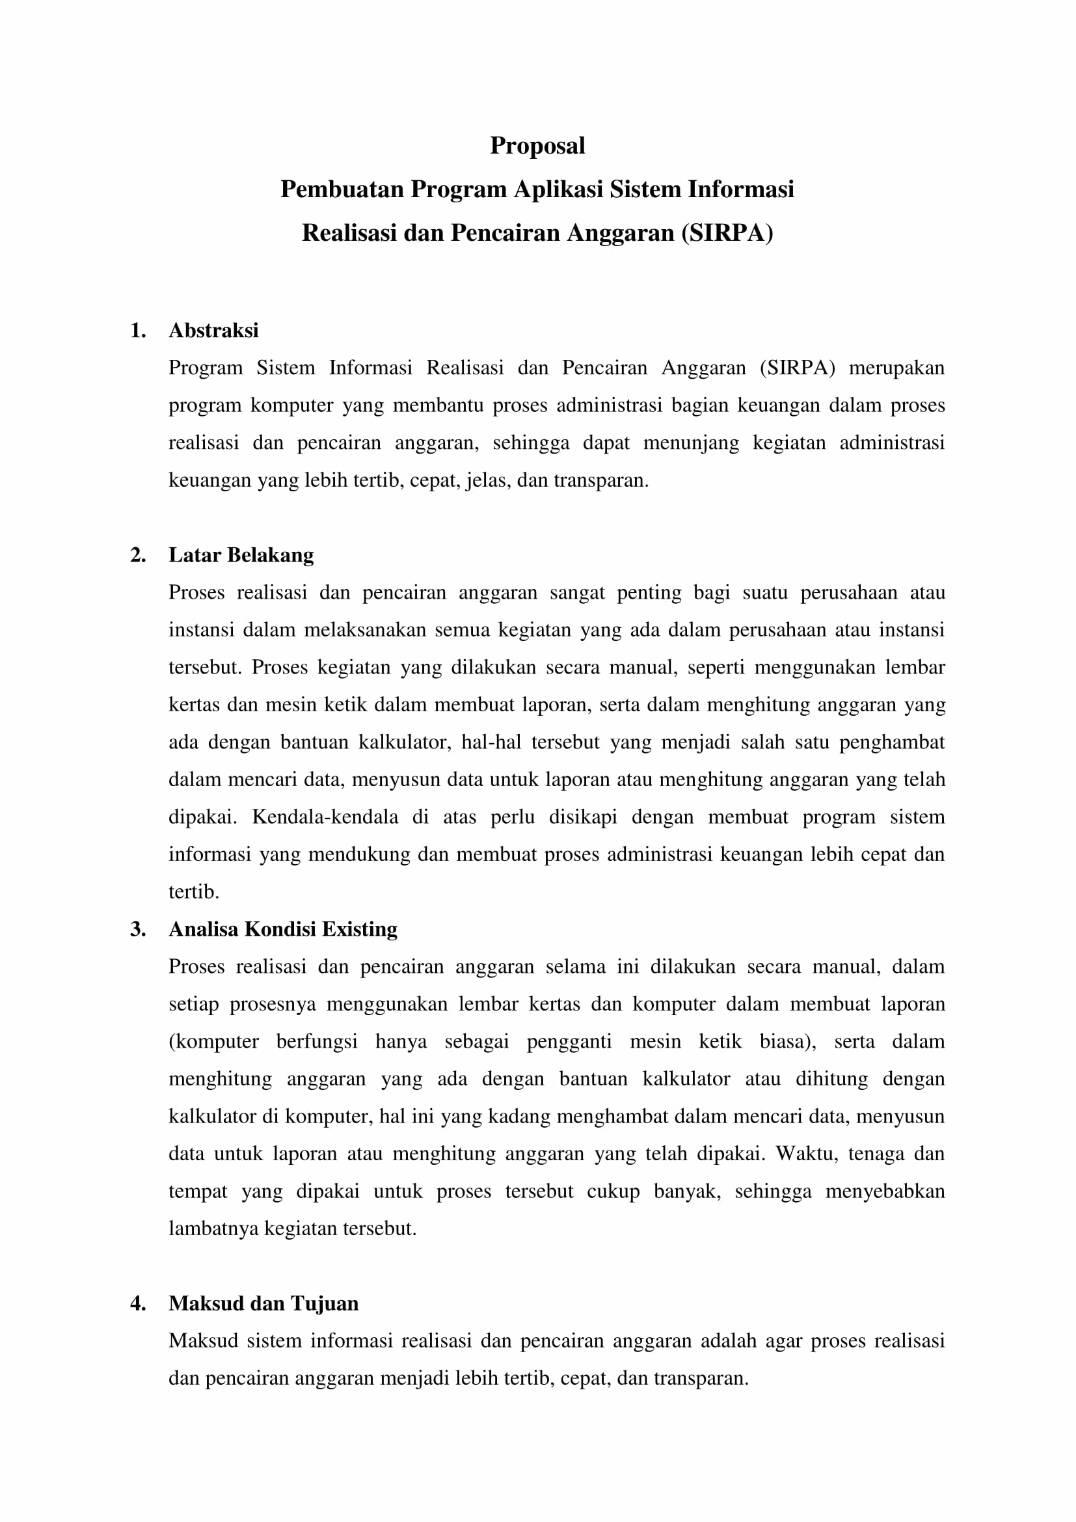 Contoh Proposal Proyek : contoh, proposal, proyek, IRAZ:, Contoh, Proposal, Proyek